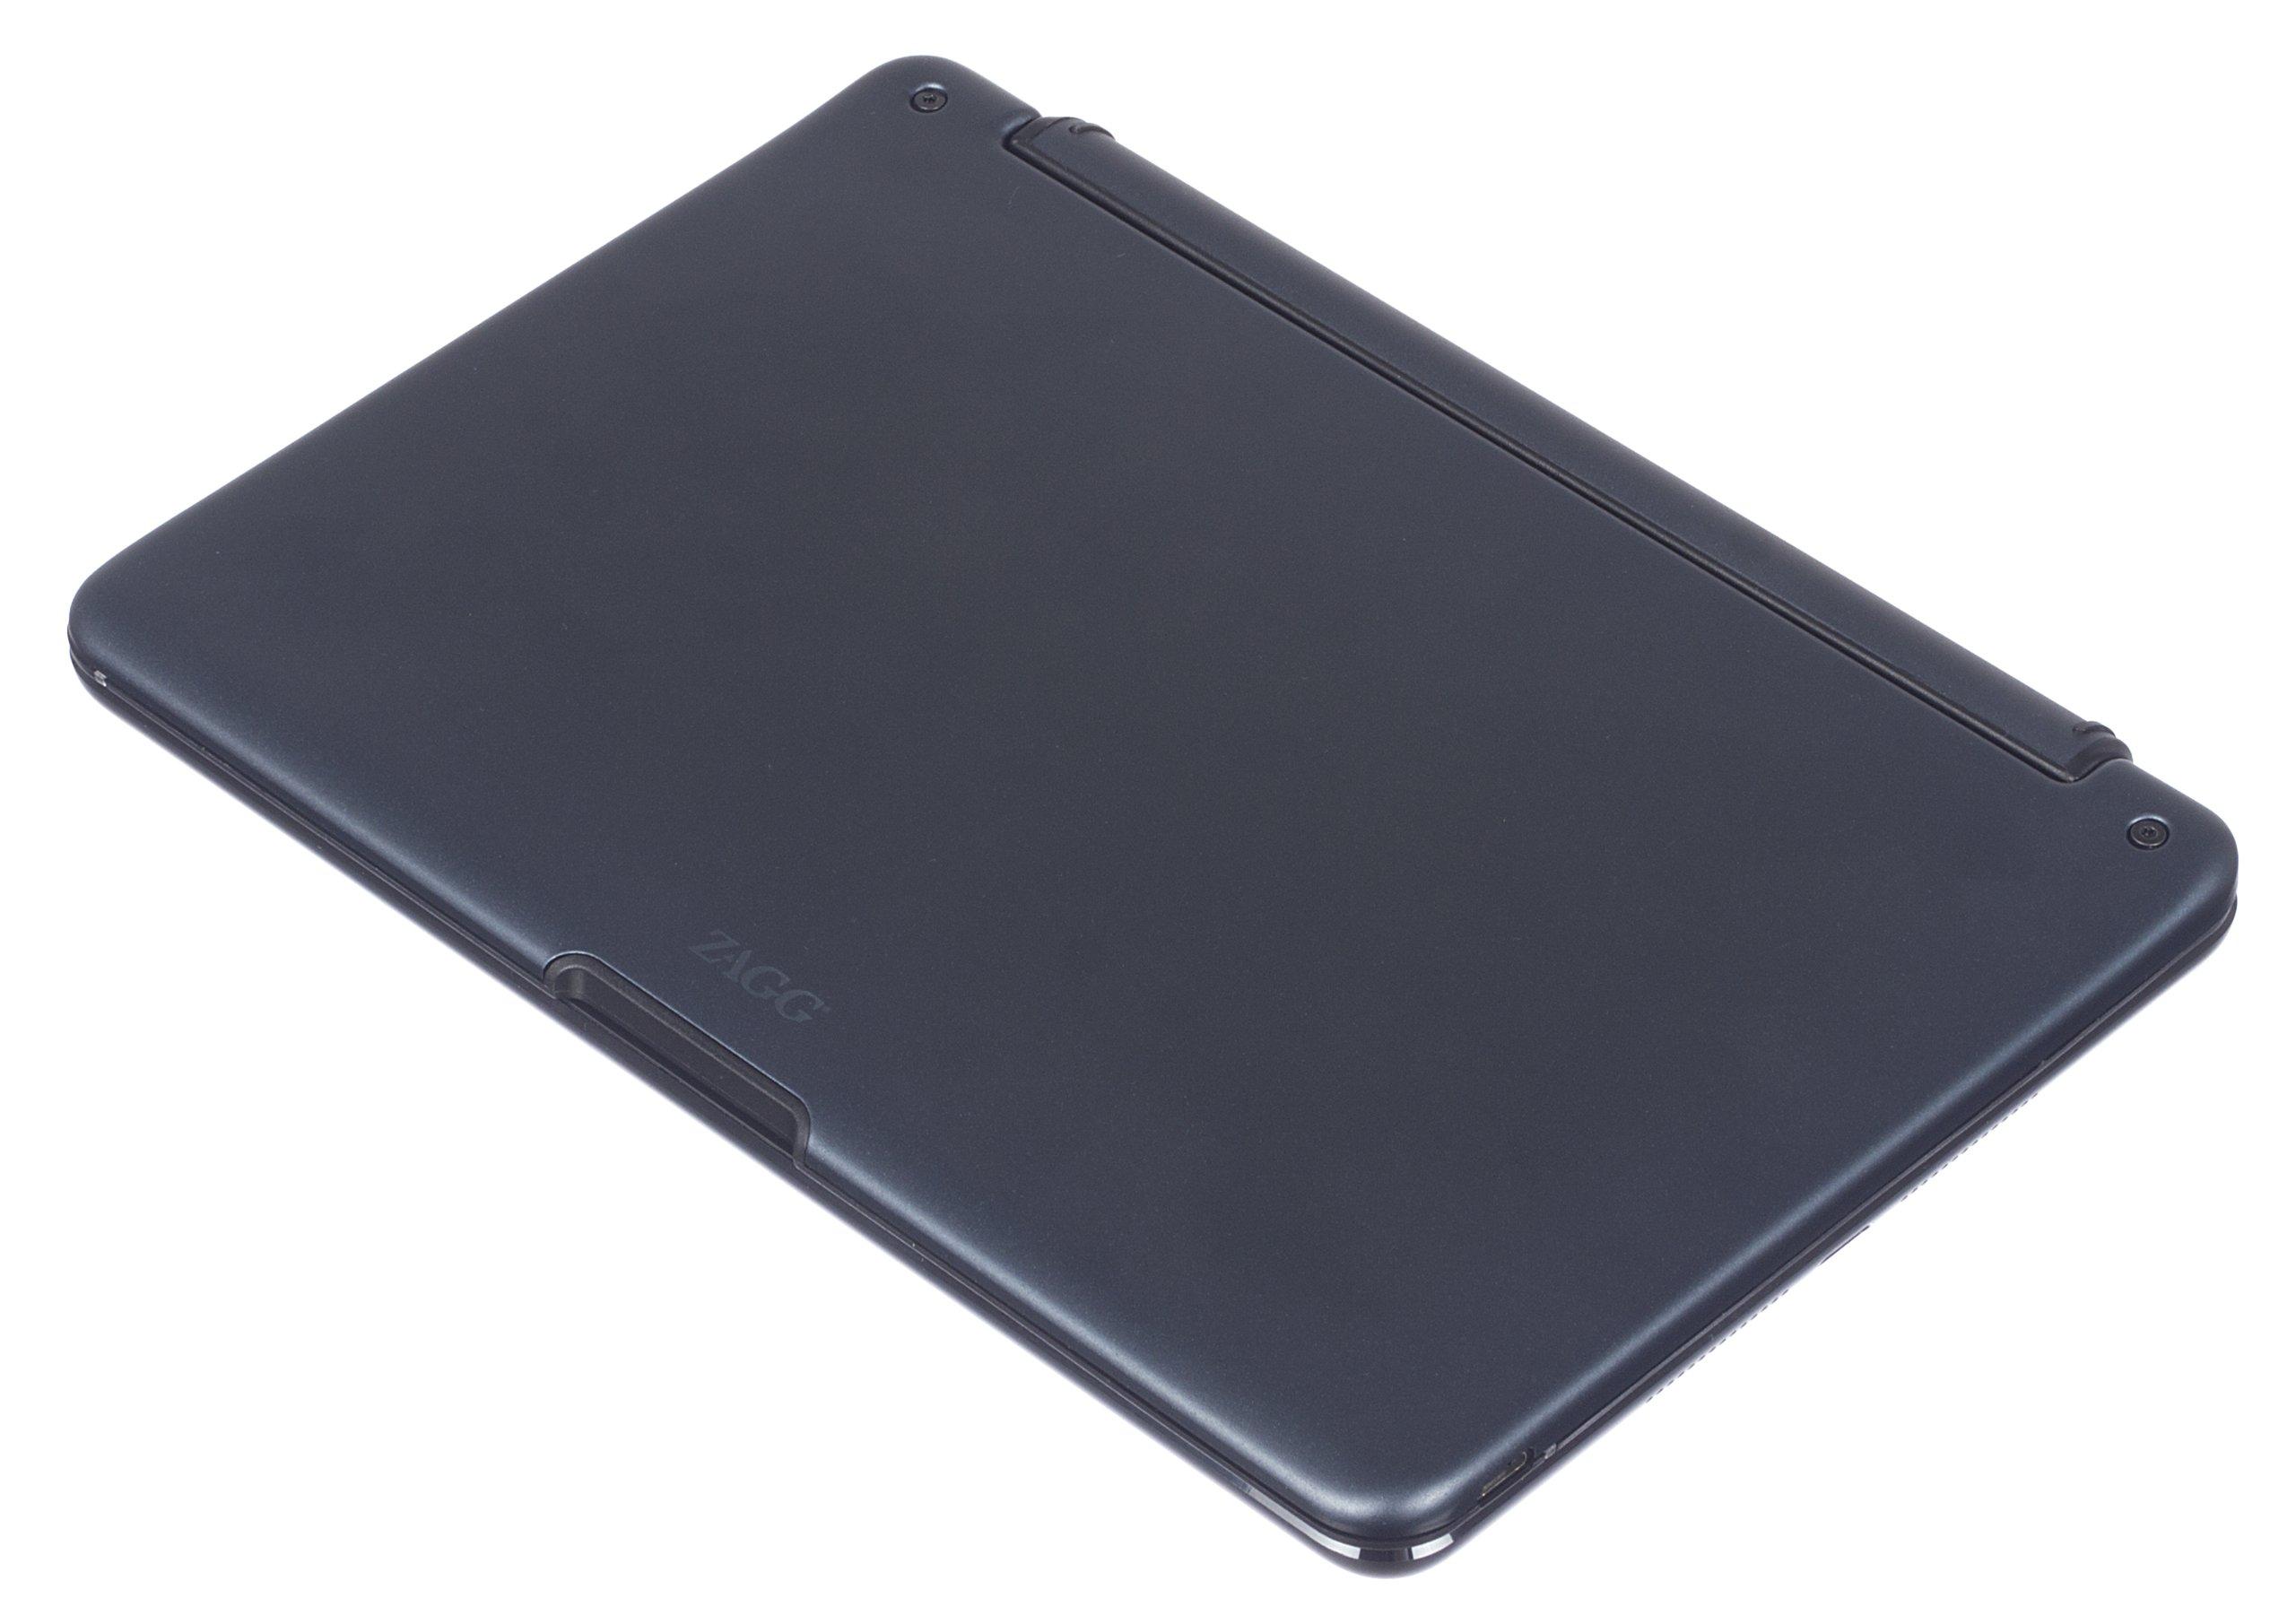 ZAGG Cover with Backlit Bluetooth Keyboard for Apple iPad mini 1 /  mini 2 - Black